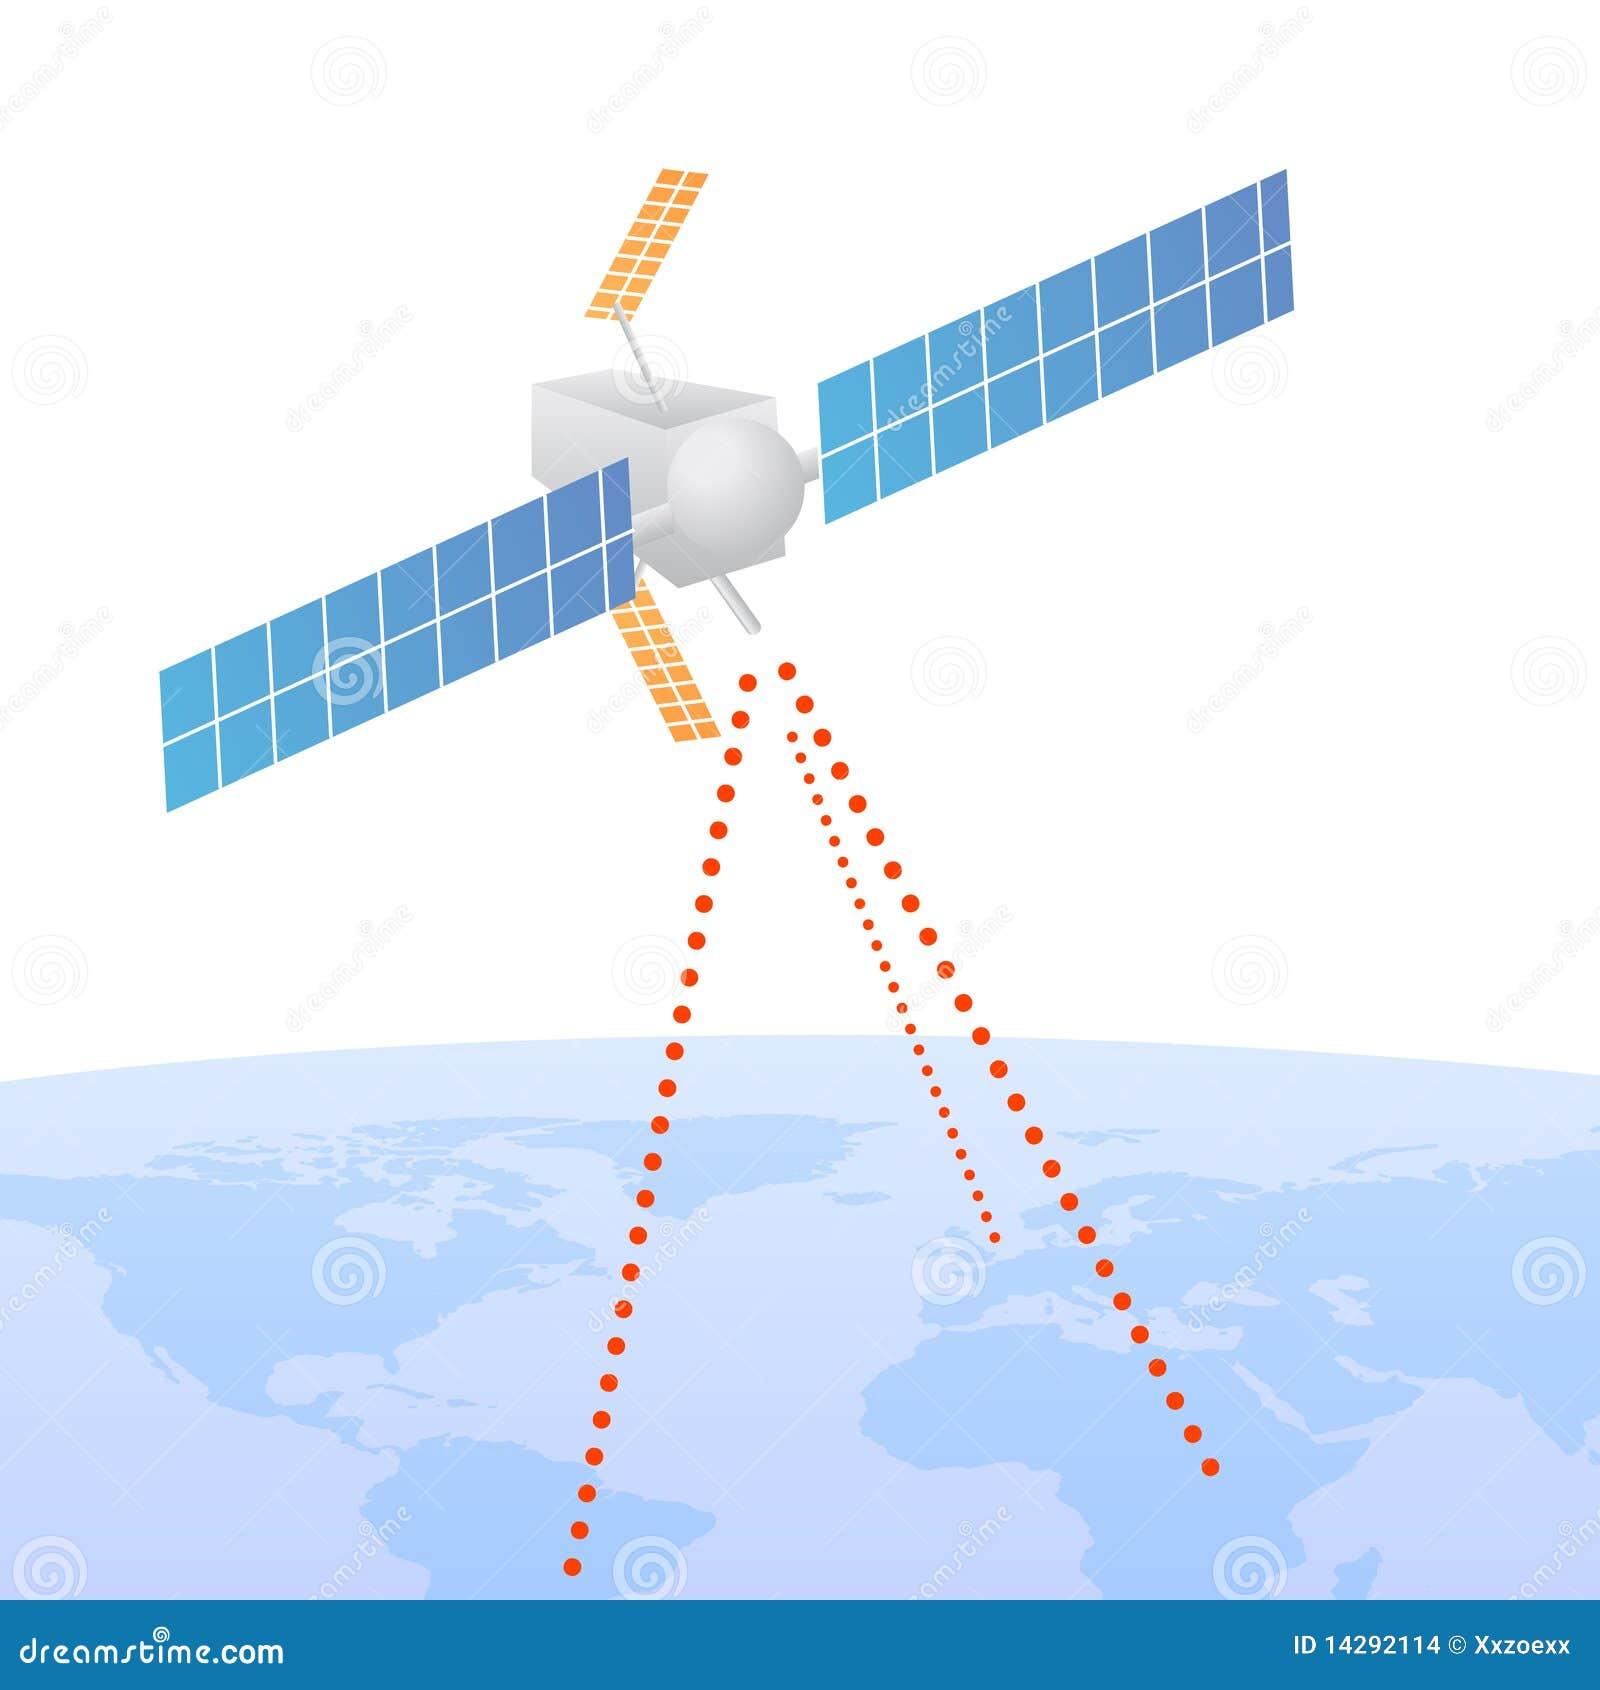 world satellite image uqB3E7K